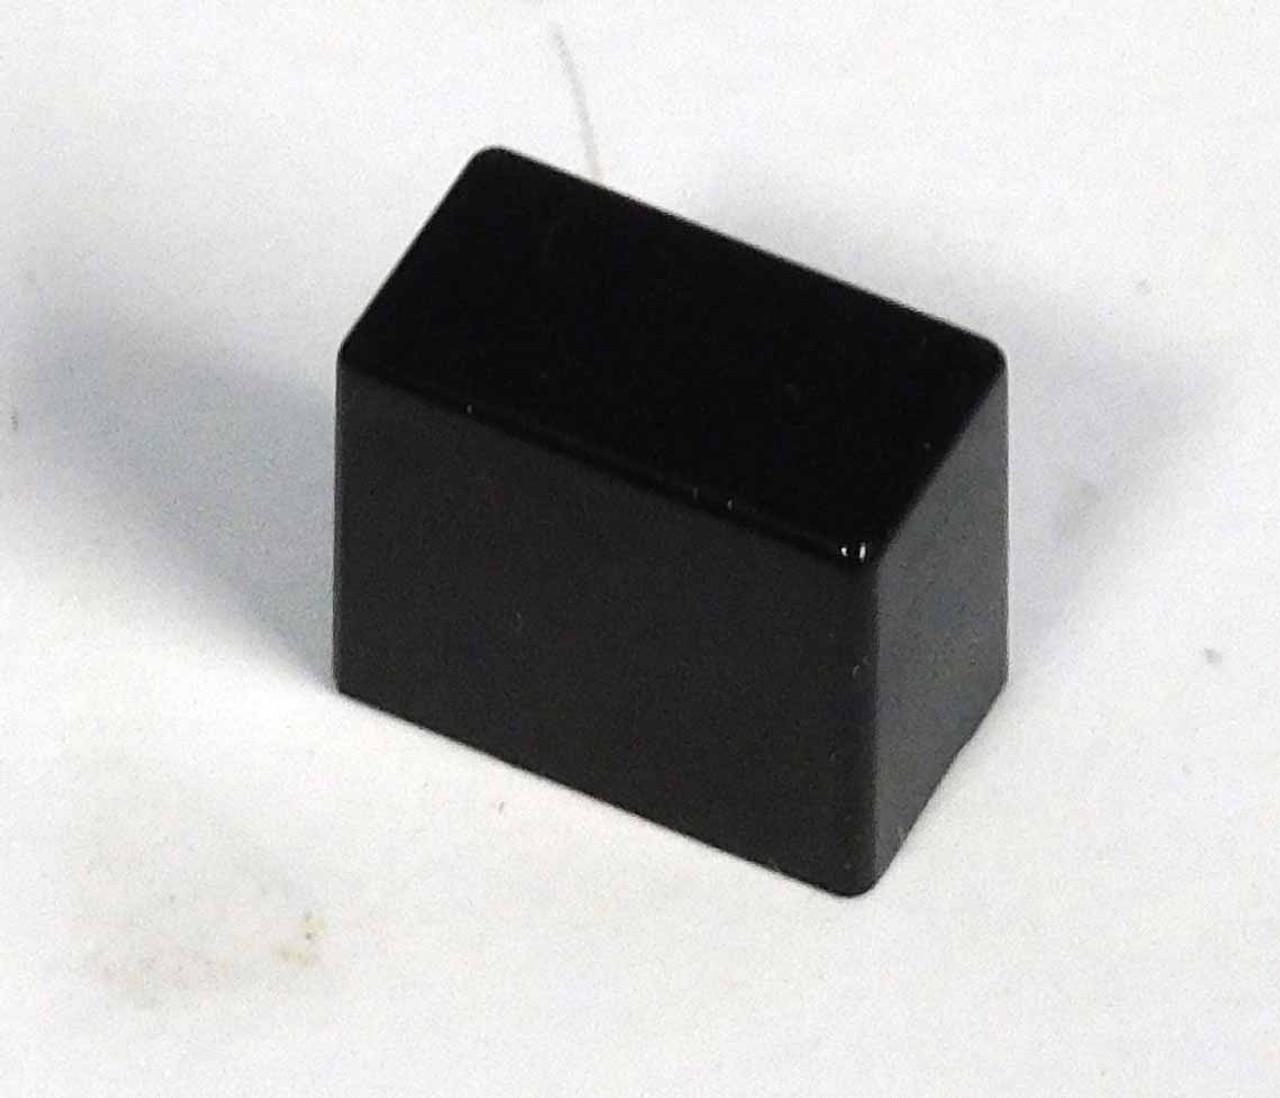 SOMMER CABLE SC GALILEO 238 2 x 0,38mm² 100/% geschirmt Mikrofonkabel200-0251